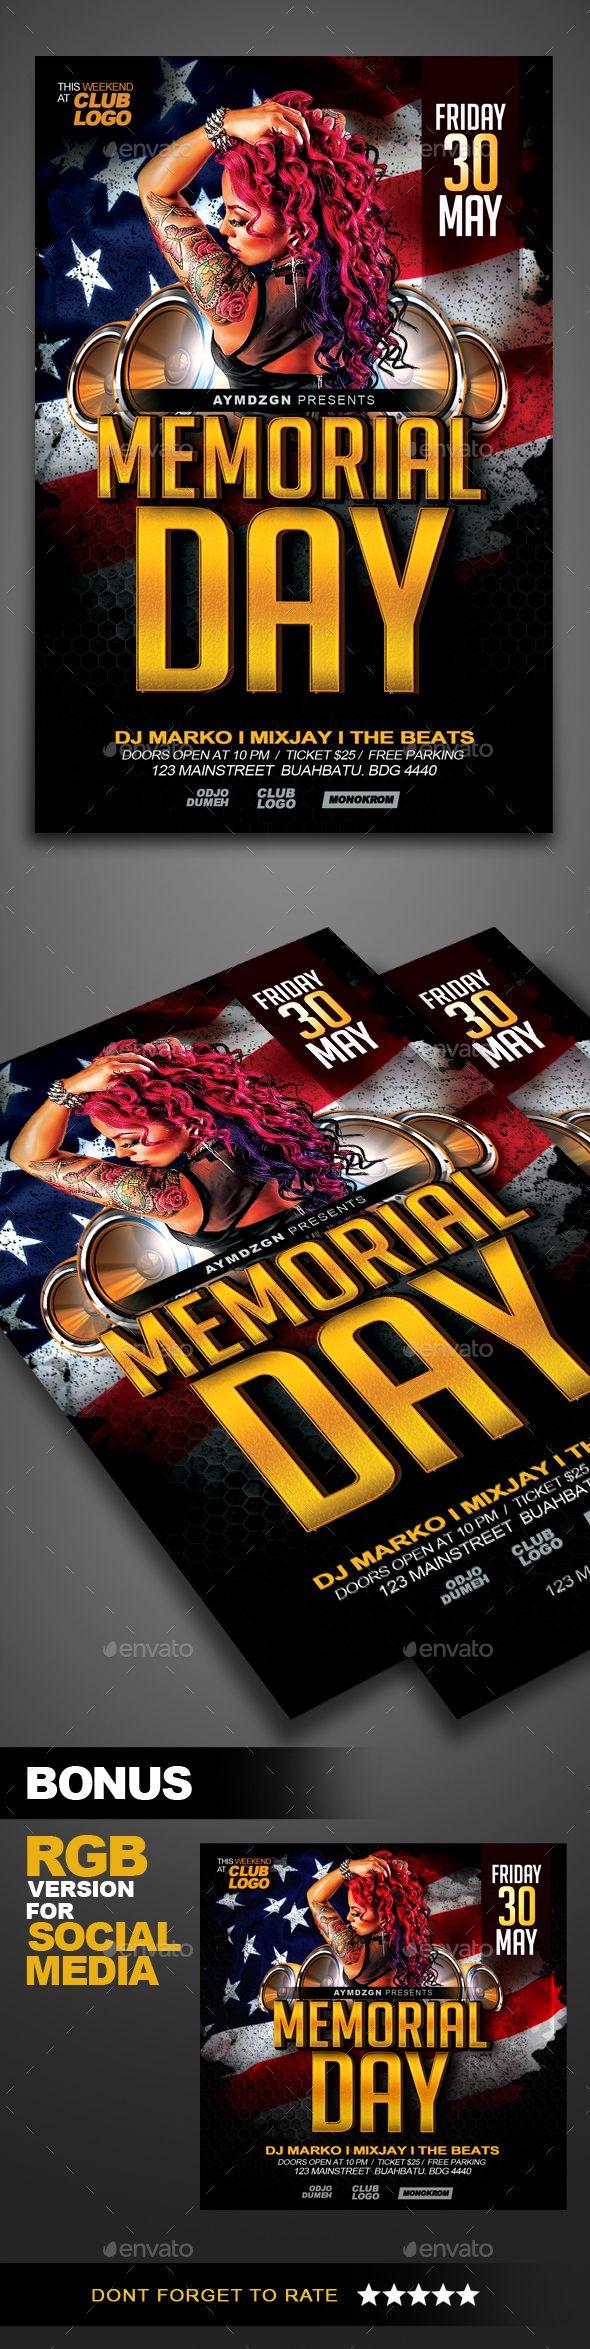 memorial day flyer template free timiz conceptzmusic co